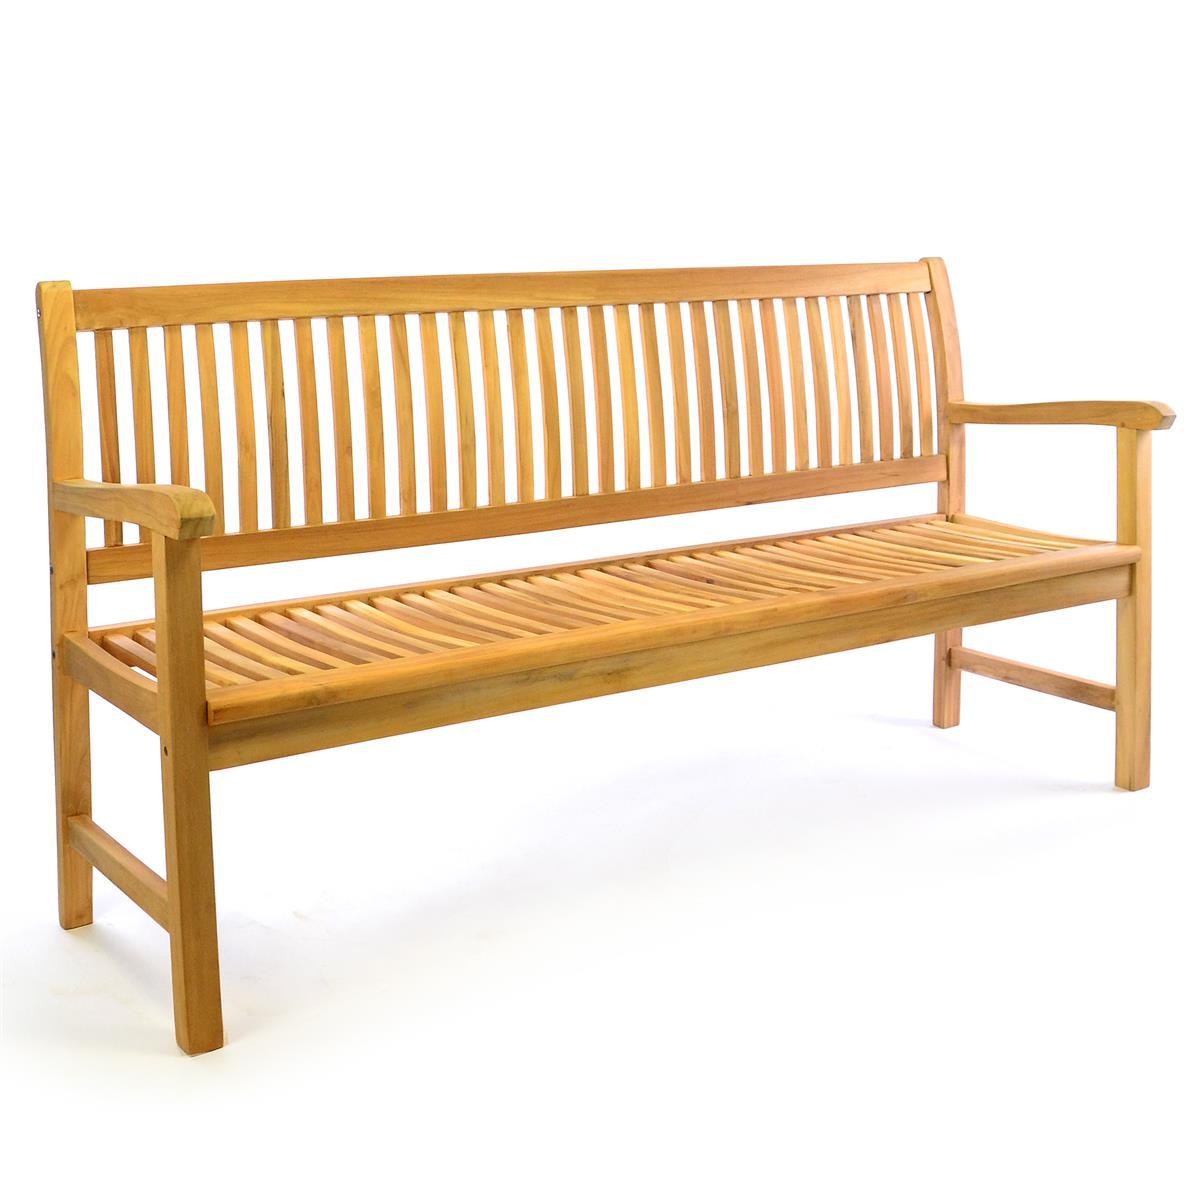 DIVERO 3-Sitzer Gartenbank Parkbank hochwertig massiv Teak Holz natur 180cm